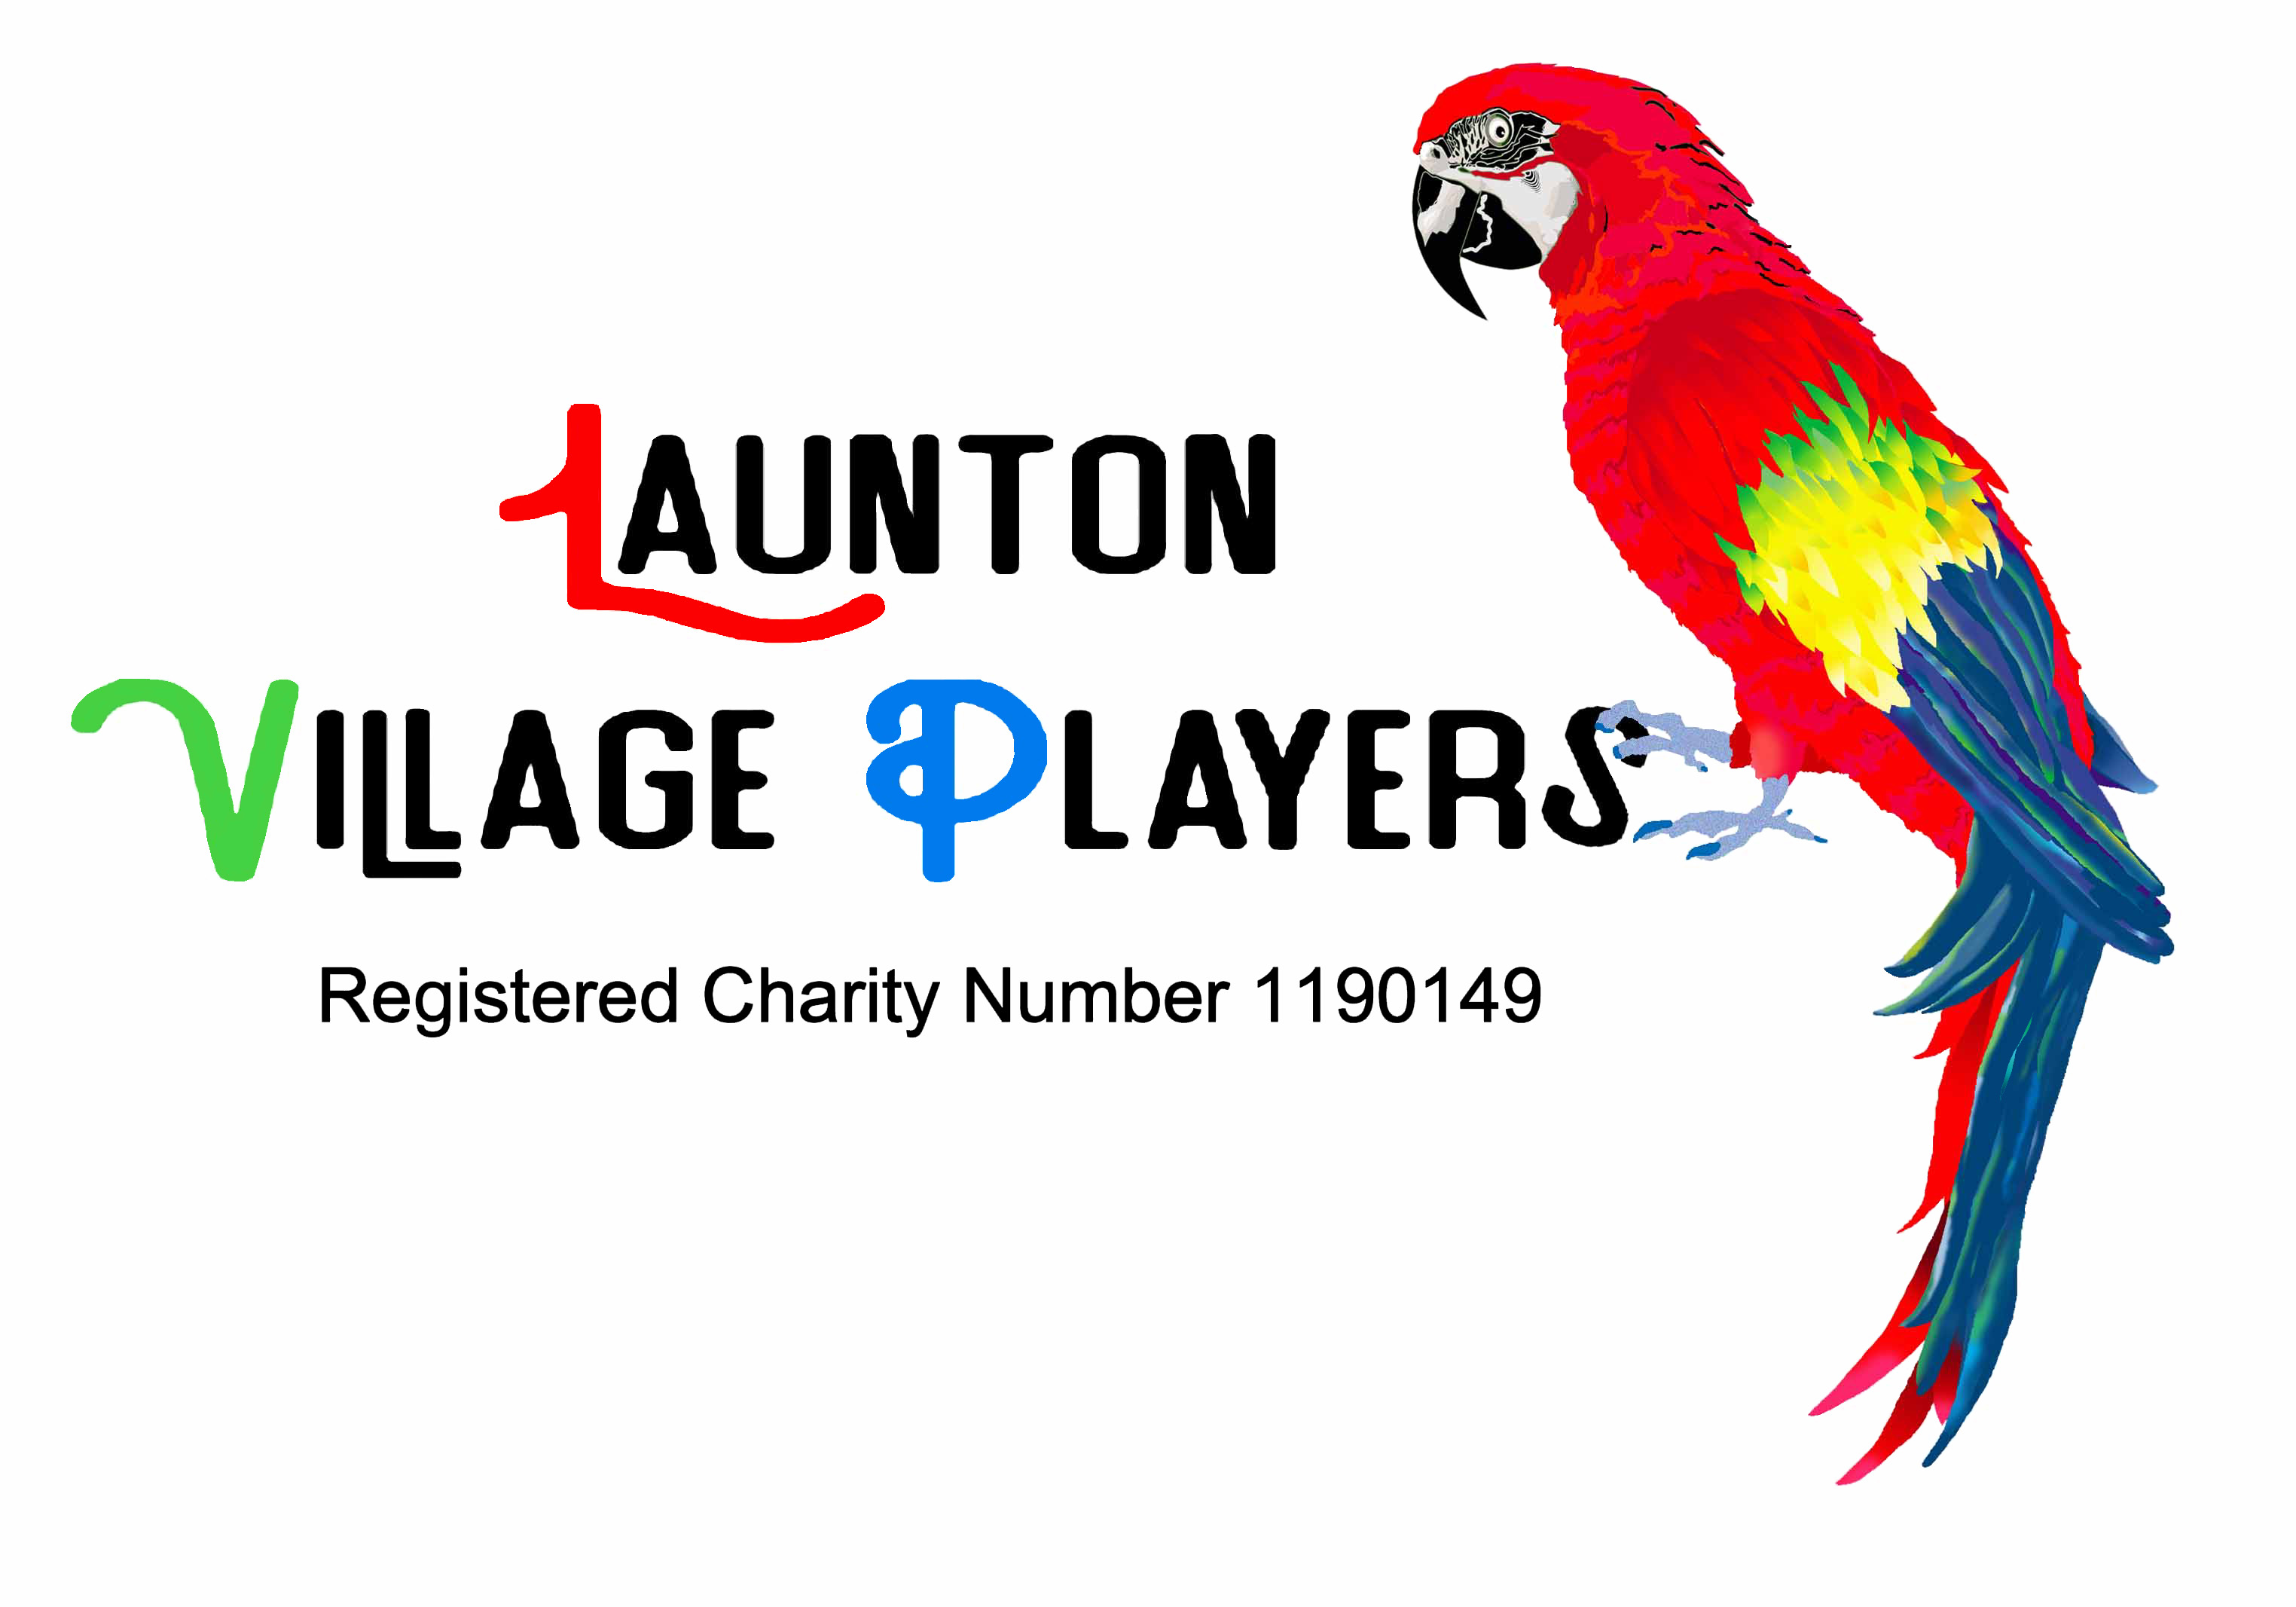 Launton Village Players's logo